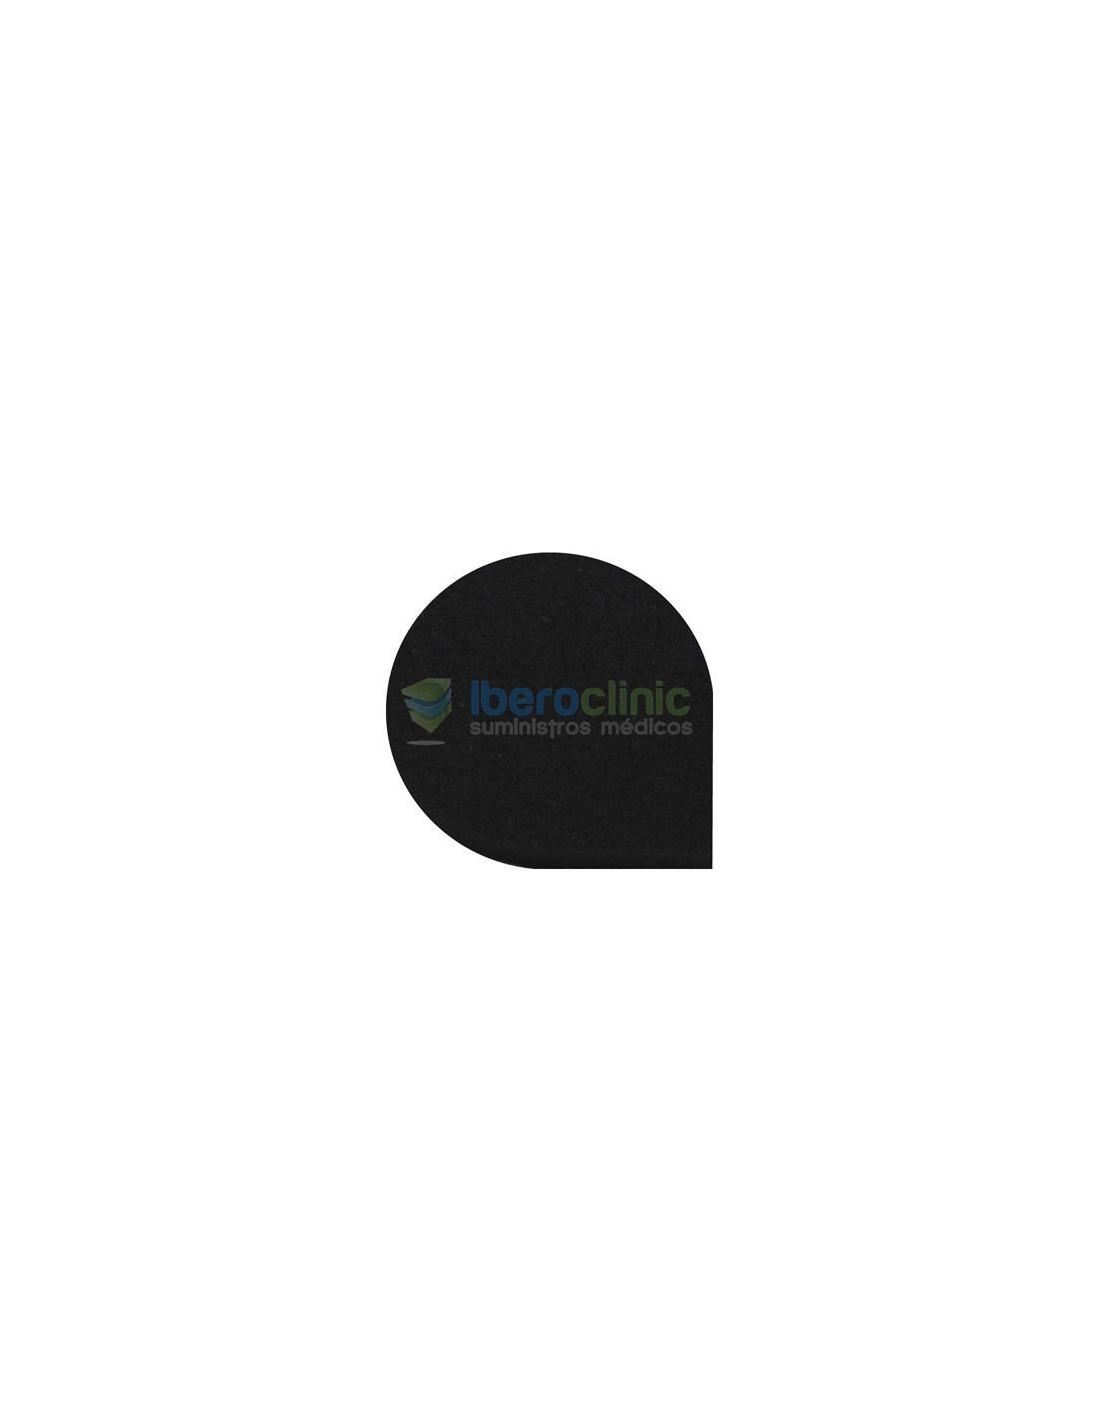 technichoc 7225 material para plantillas de podologia iberoclinic. Black Bedroom Furniture Sets. Home Design Ideas